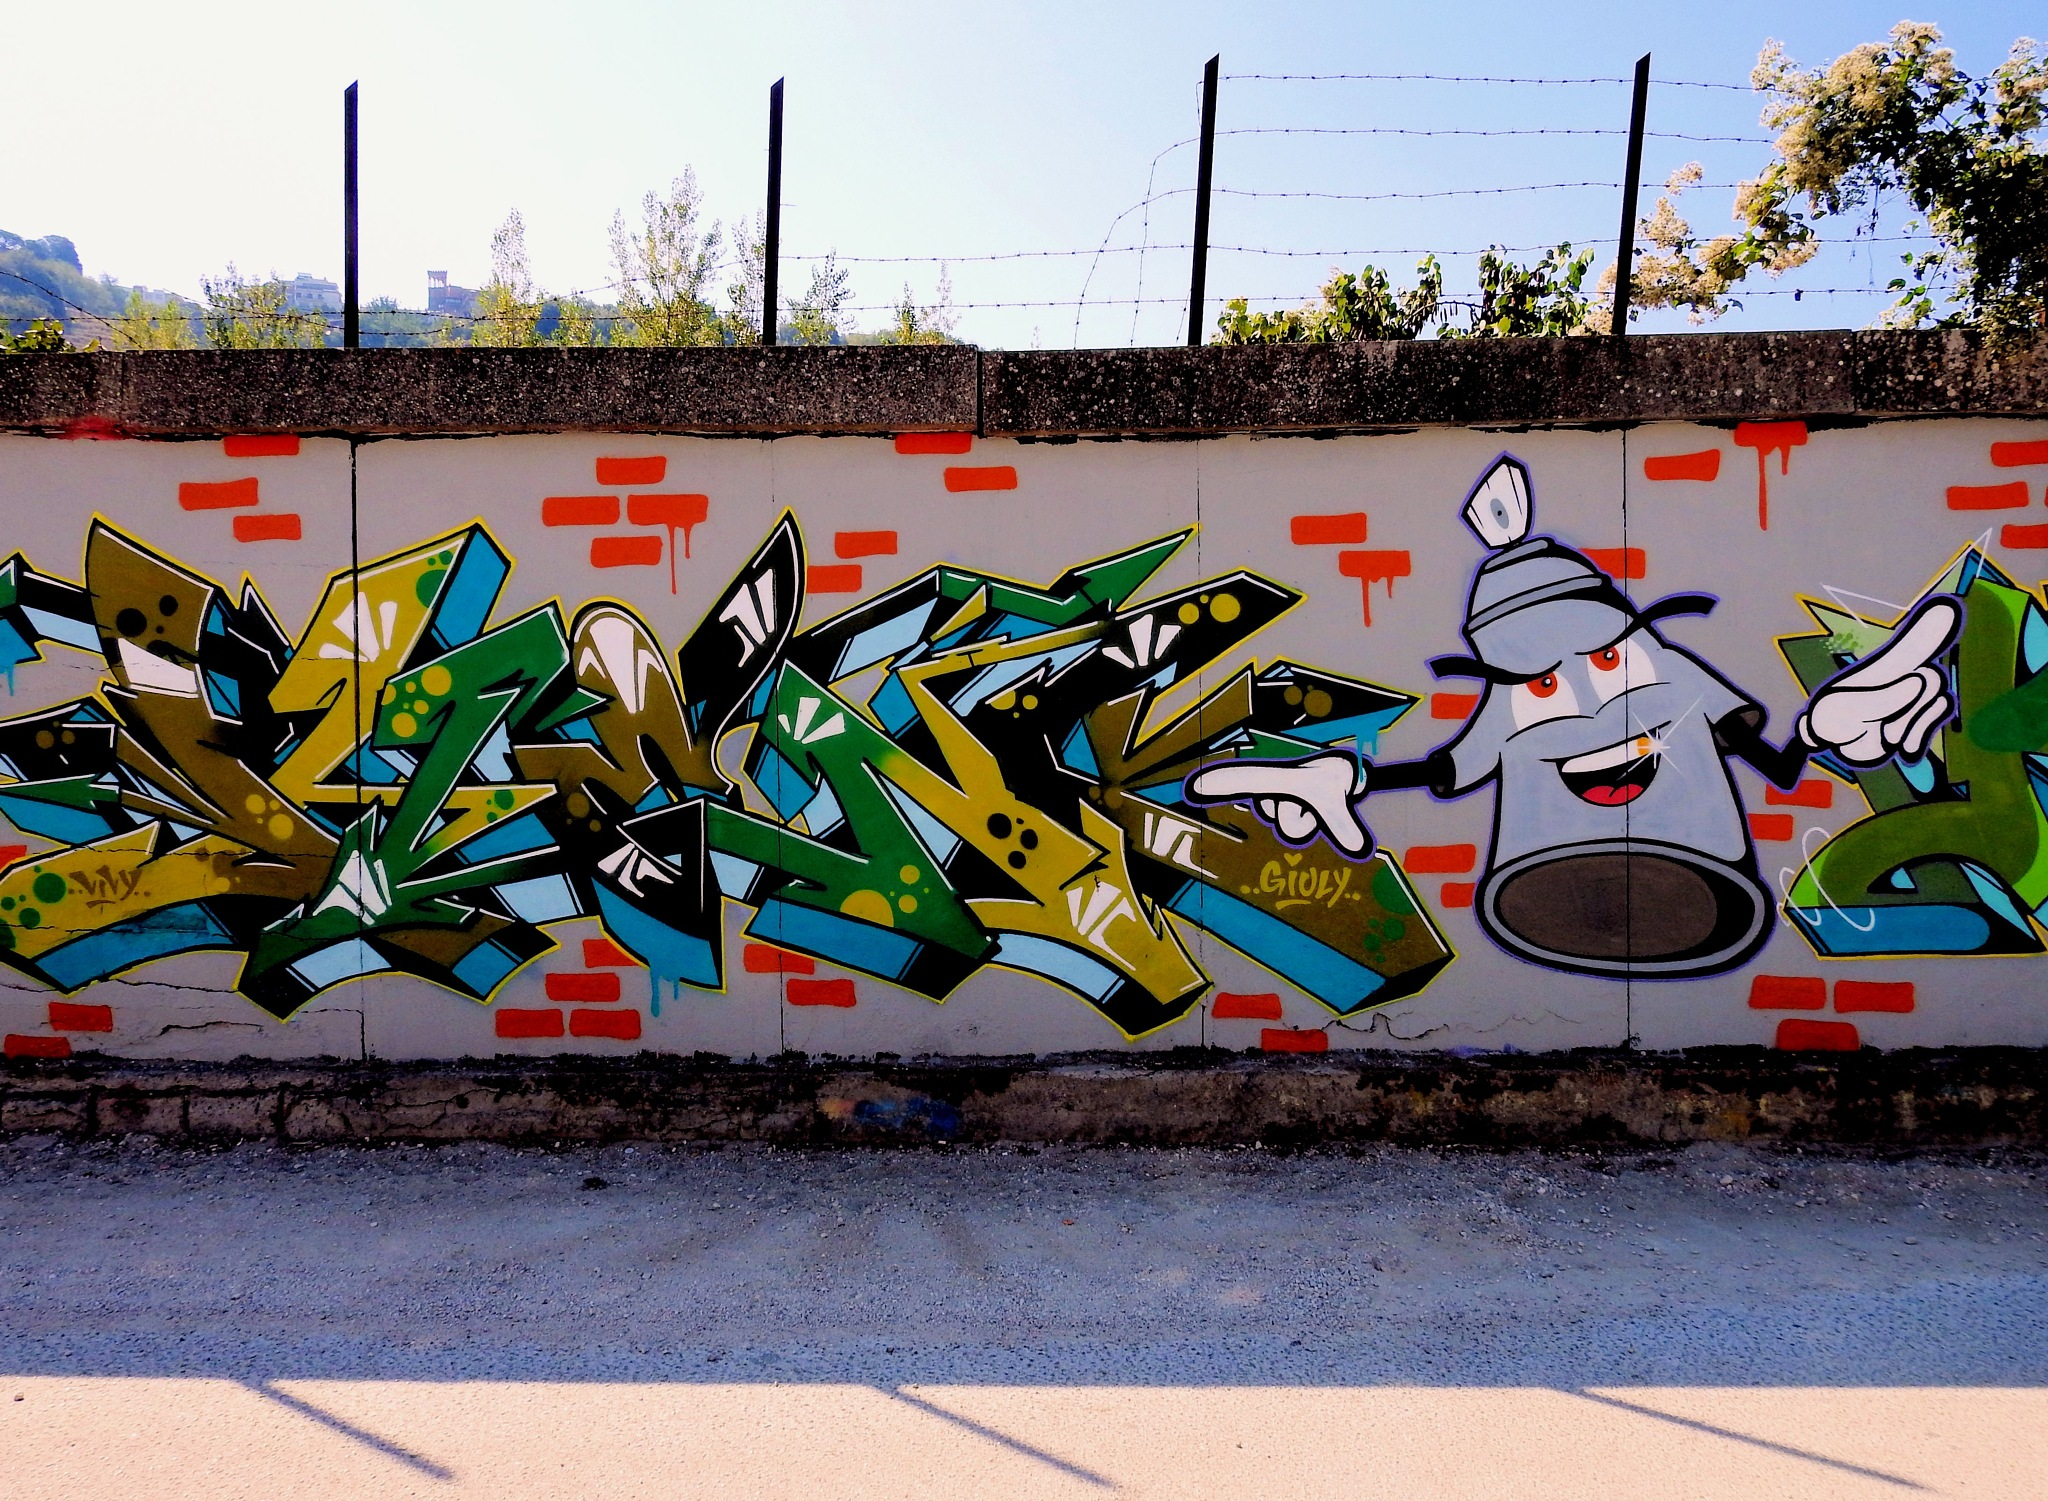 Naples via Cupa del Poligono - The Grey Boy! - 2 - The Long And Painting Road by Arnaldo De Lisio